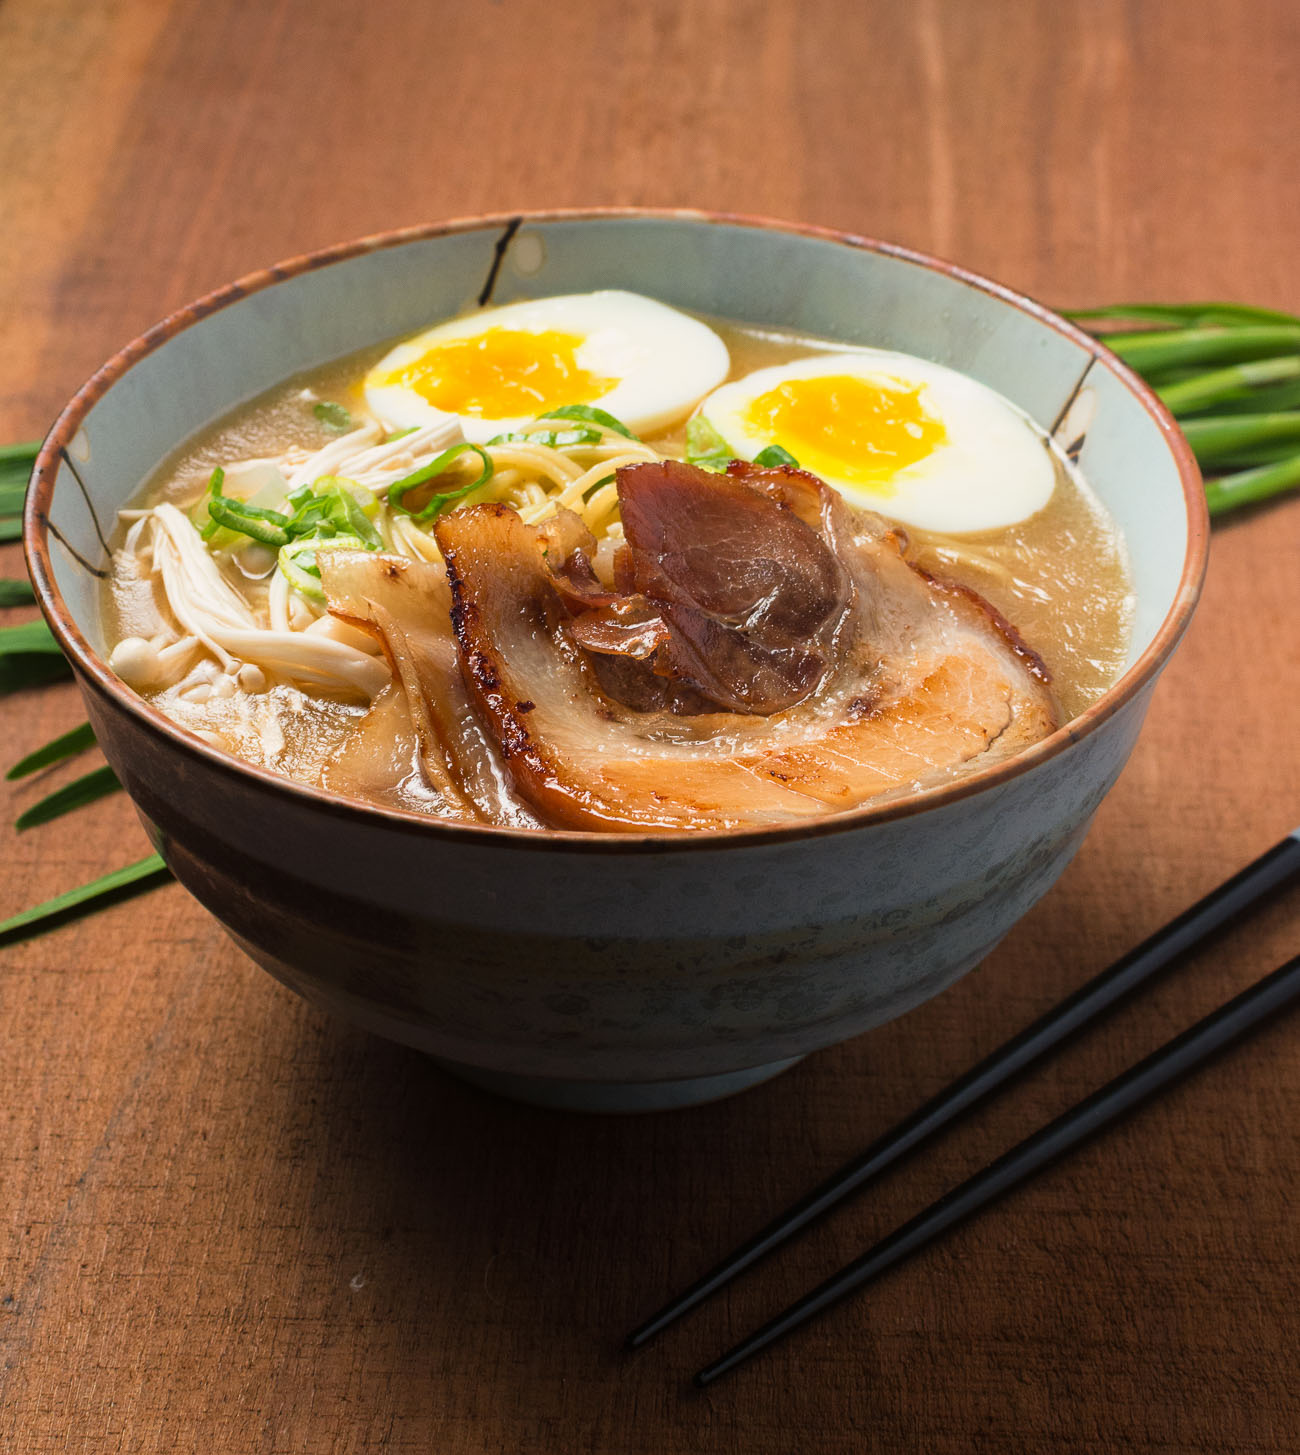 You can make tonkotsu ramen that's as the best ramen joint in town.